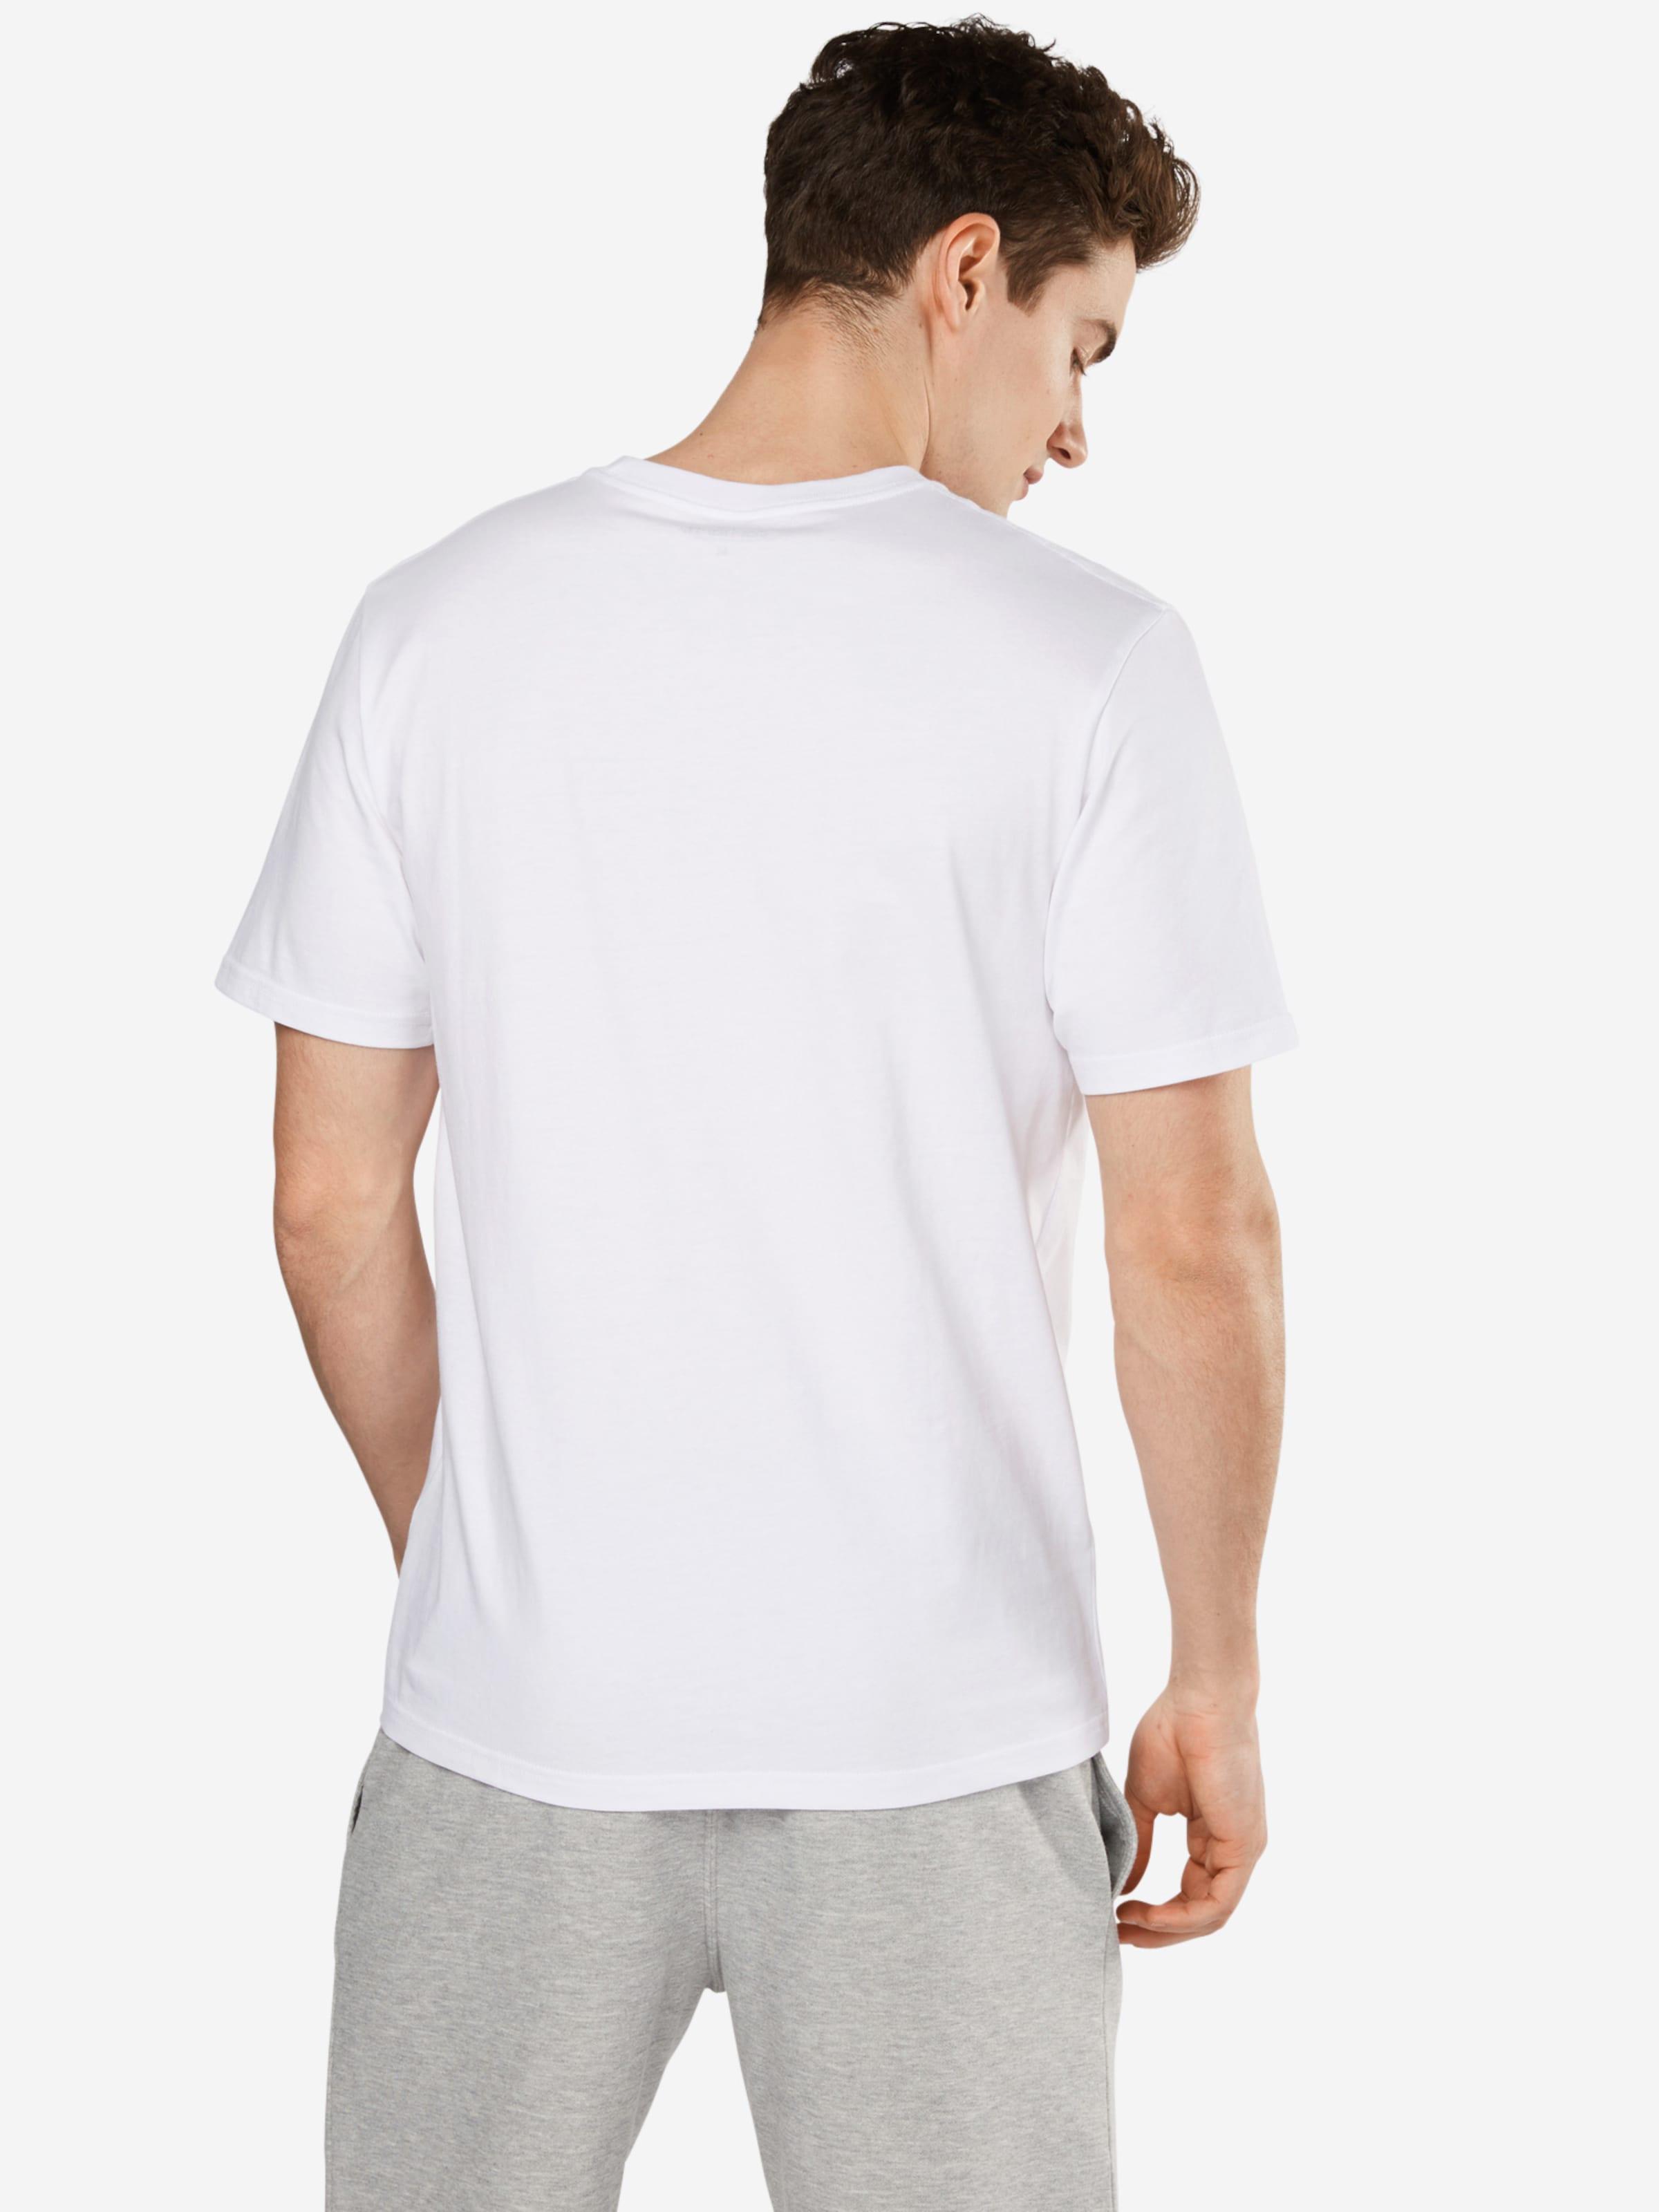 Carhartt mit T Carhartt WIP Logo WIP Shirt pCqx0